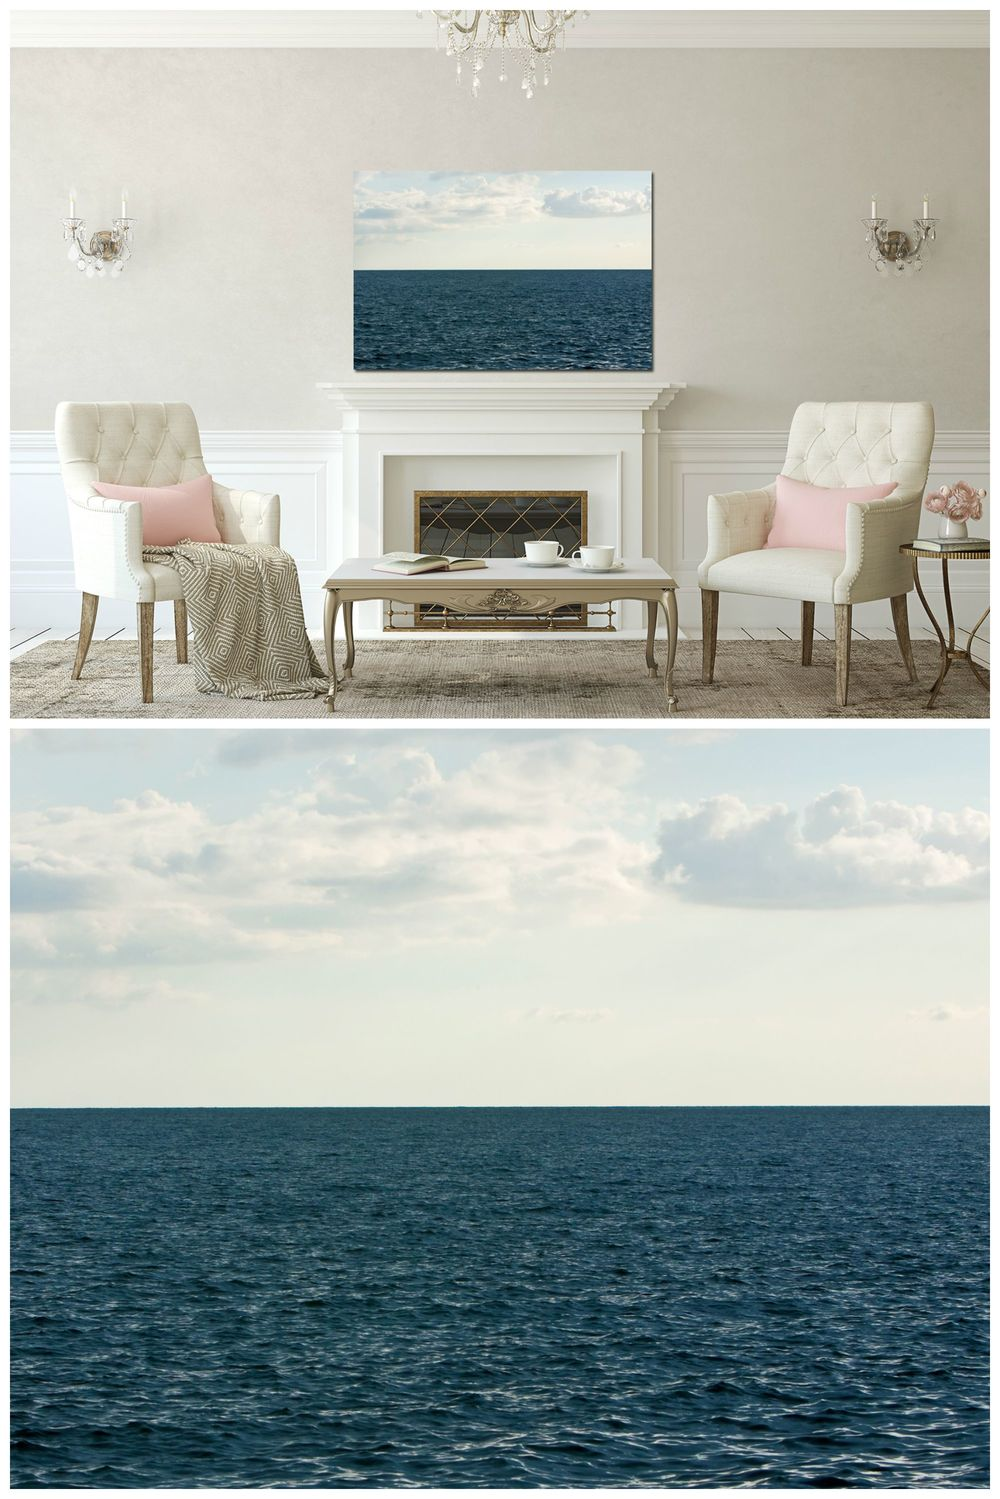 mckellar-ocean-88423.jpg